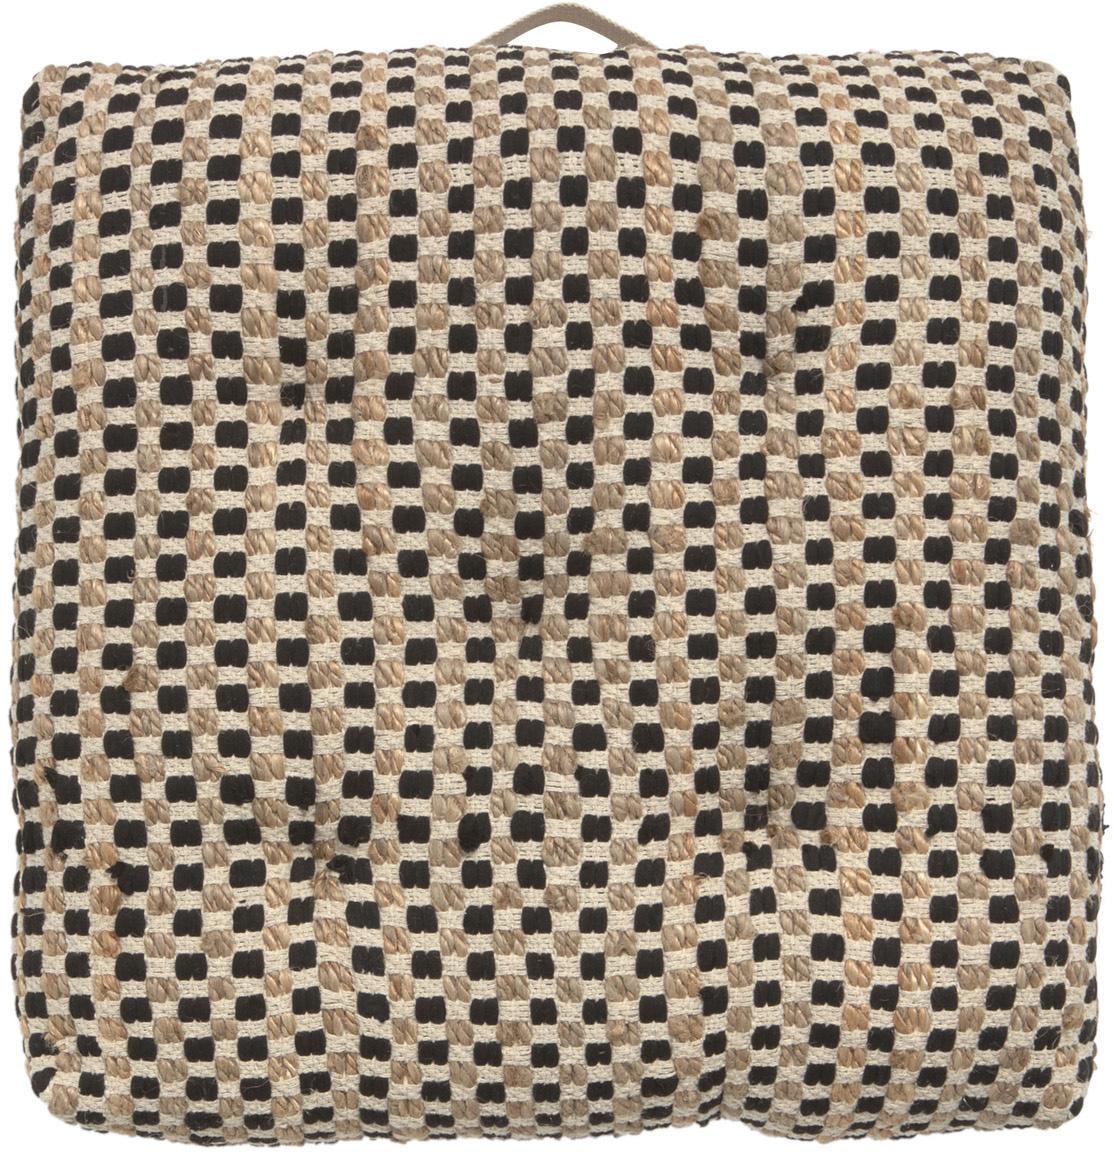 Cojín de suelo de algodón/yute Fiesta, Parte delantera: 55%algodón Chindi , 45%, Parte trasera: 100%algodón, Negro, beige, An 60 cm x L 60 cm